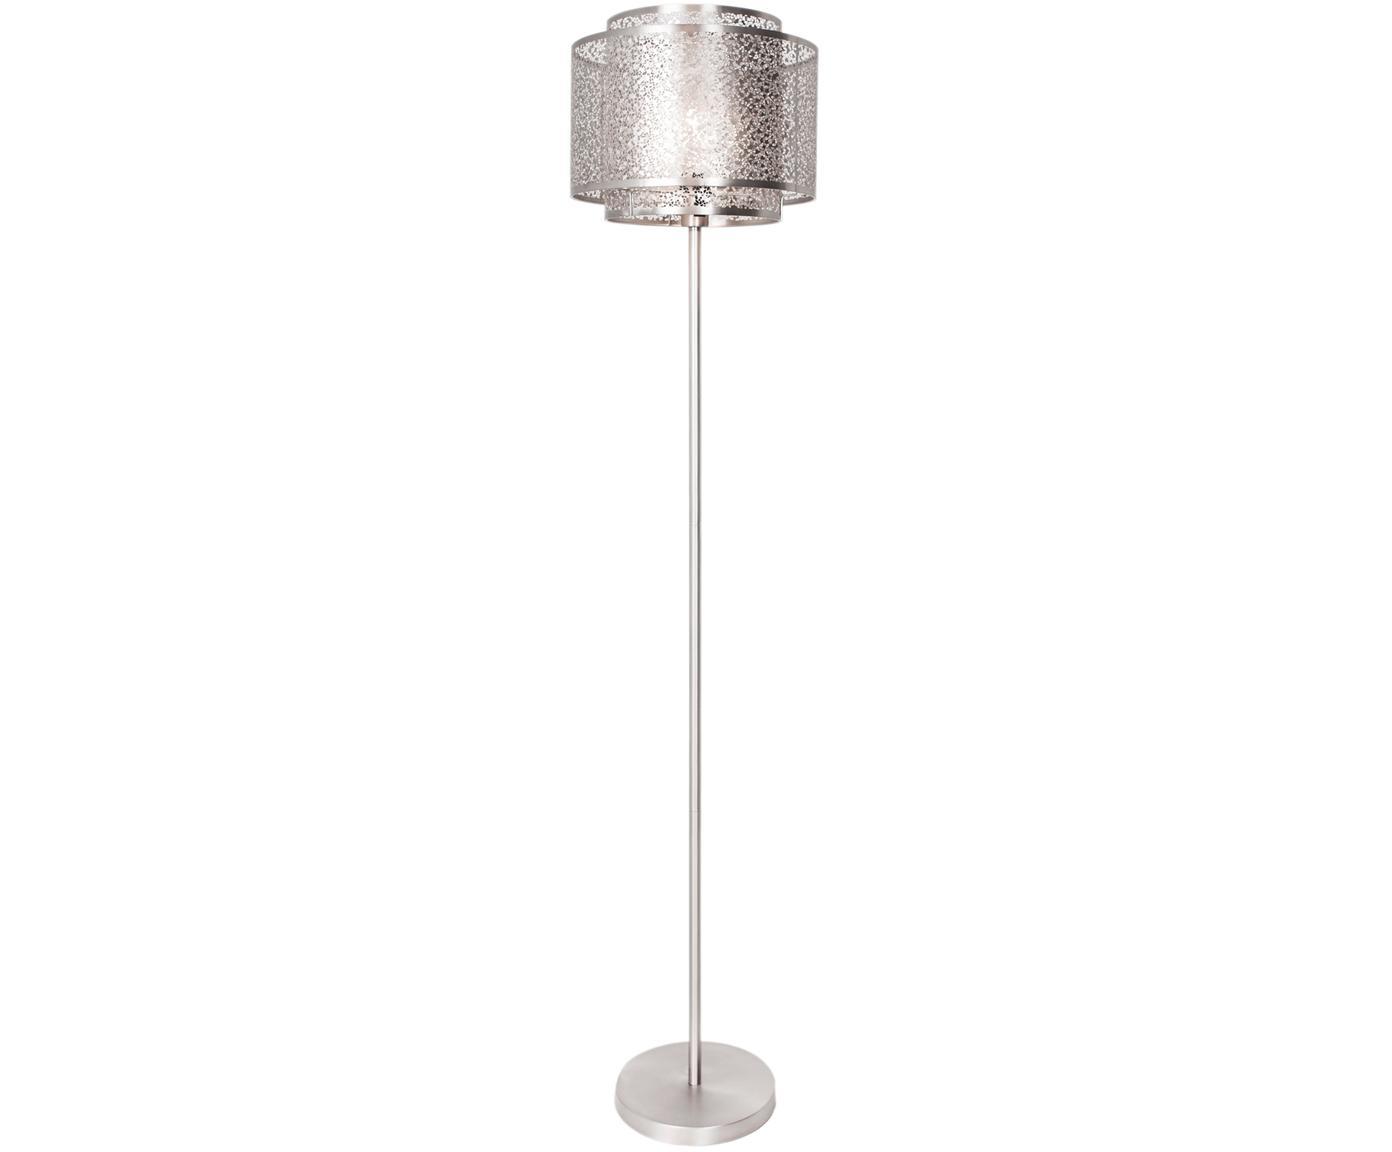 Lámpara de pie Mesh, Cable: plástico, Níquel, Ø 34 x Al 157 cm